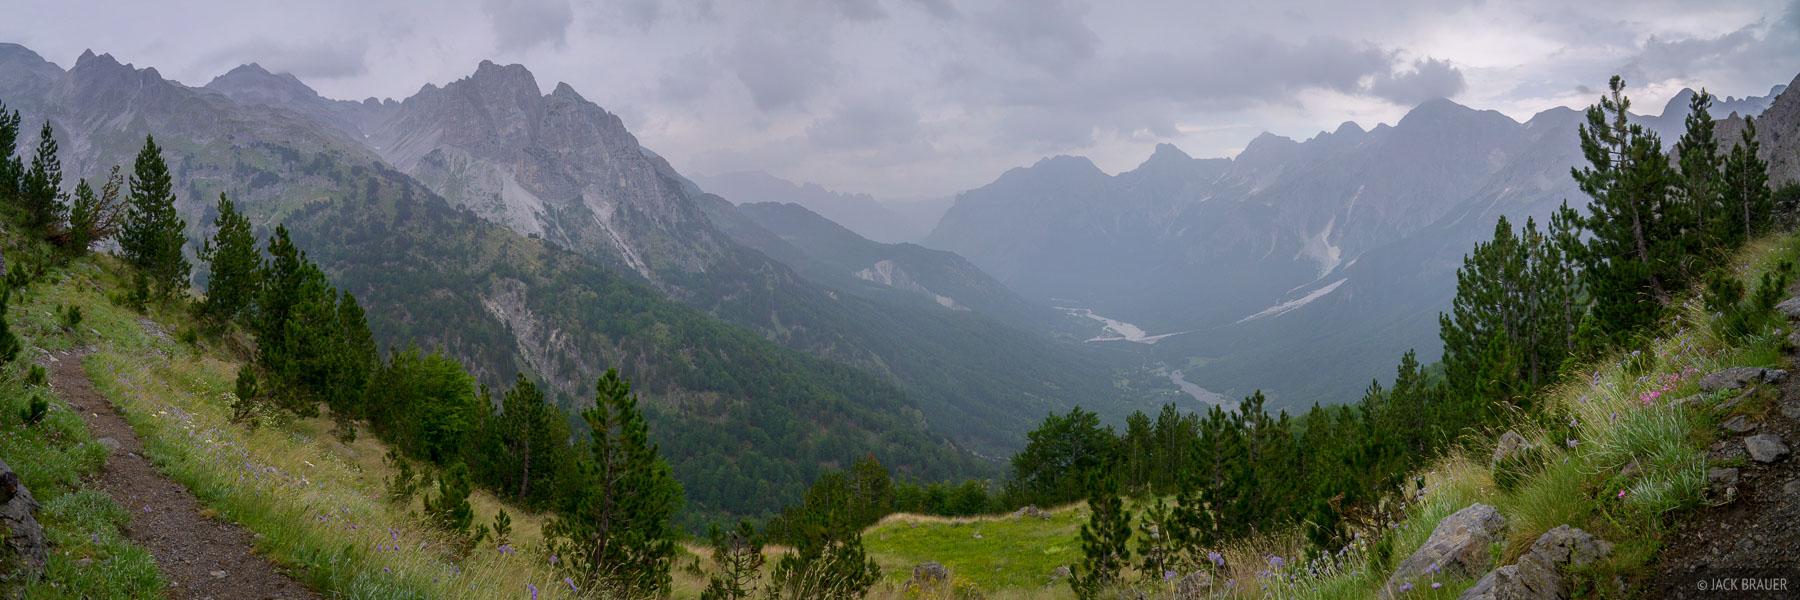 Albania, Qafa e Valbones, Bjeshkët e Namuna, Prokletije, Valbona, photo